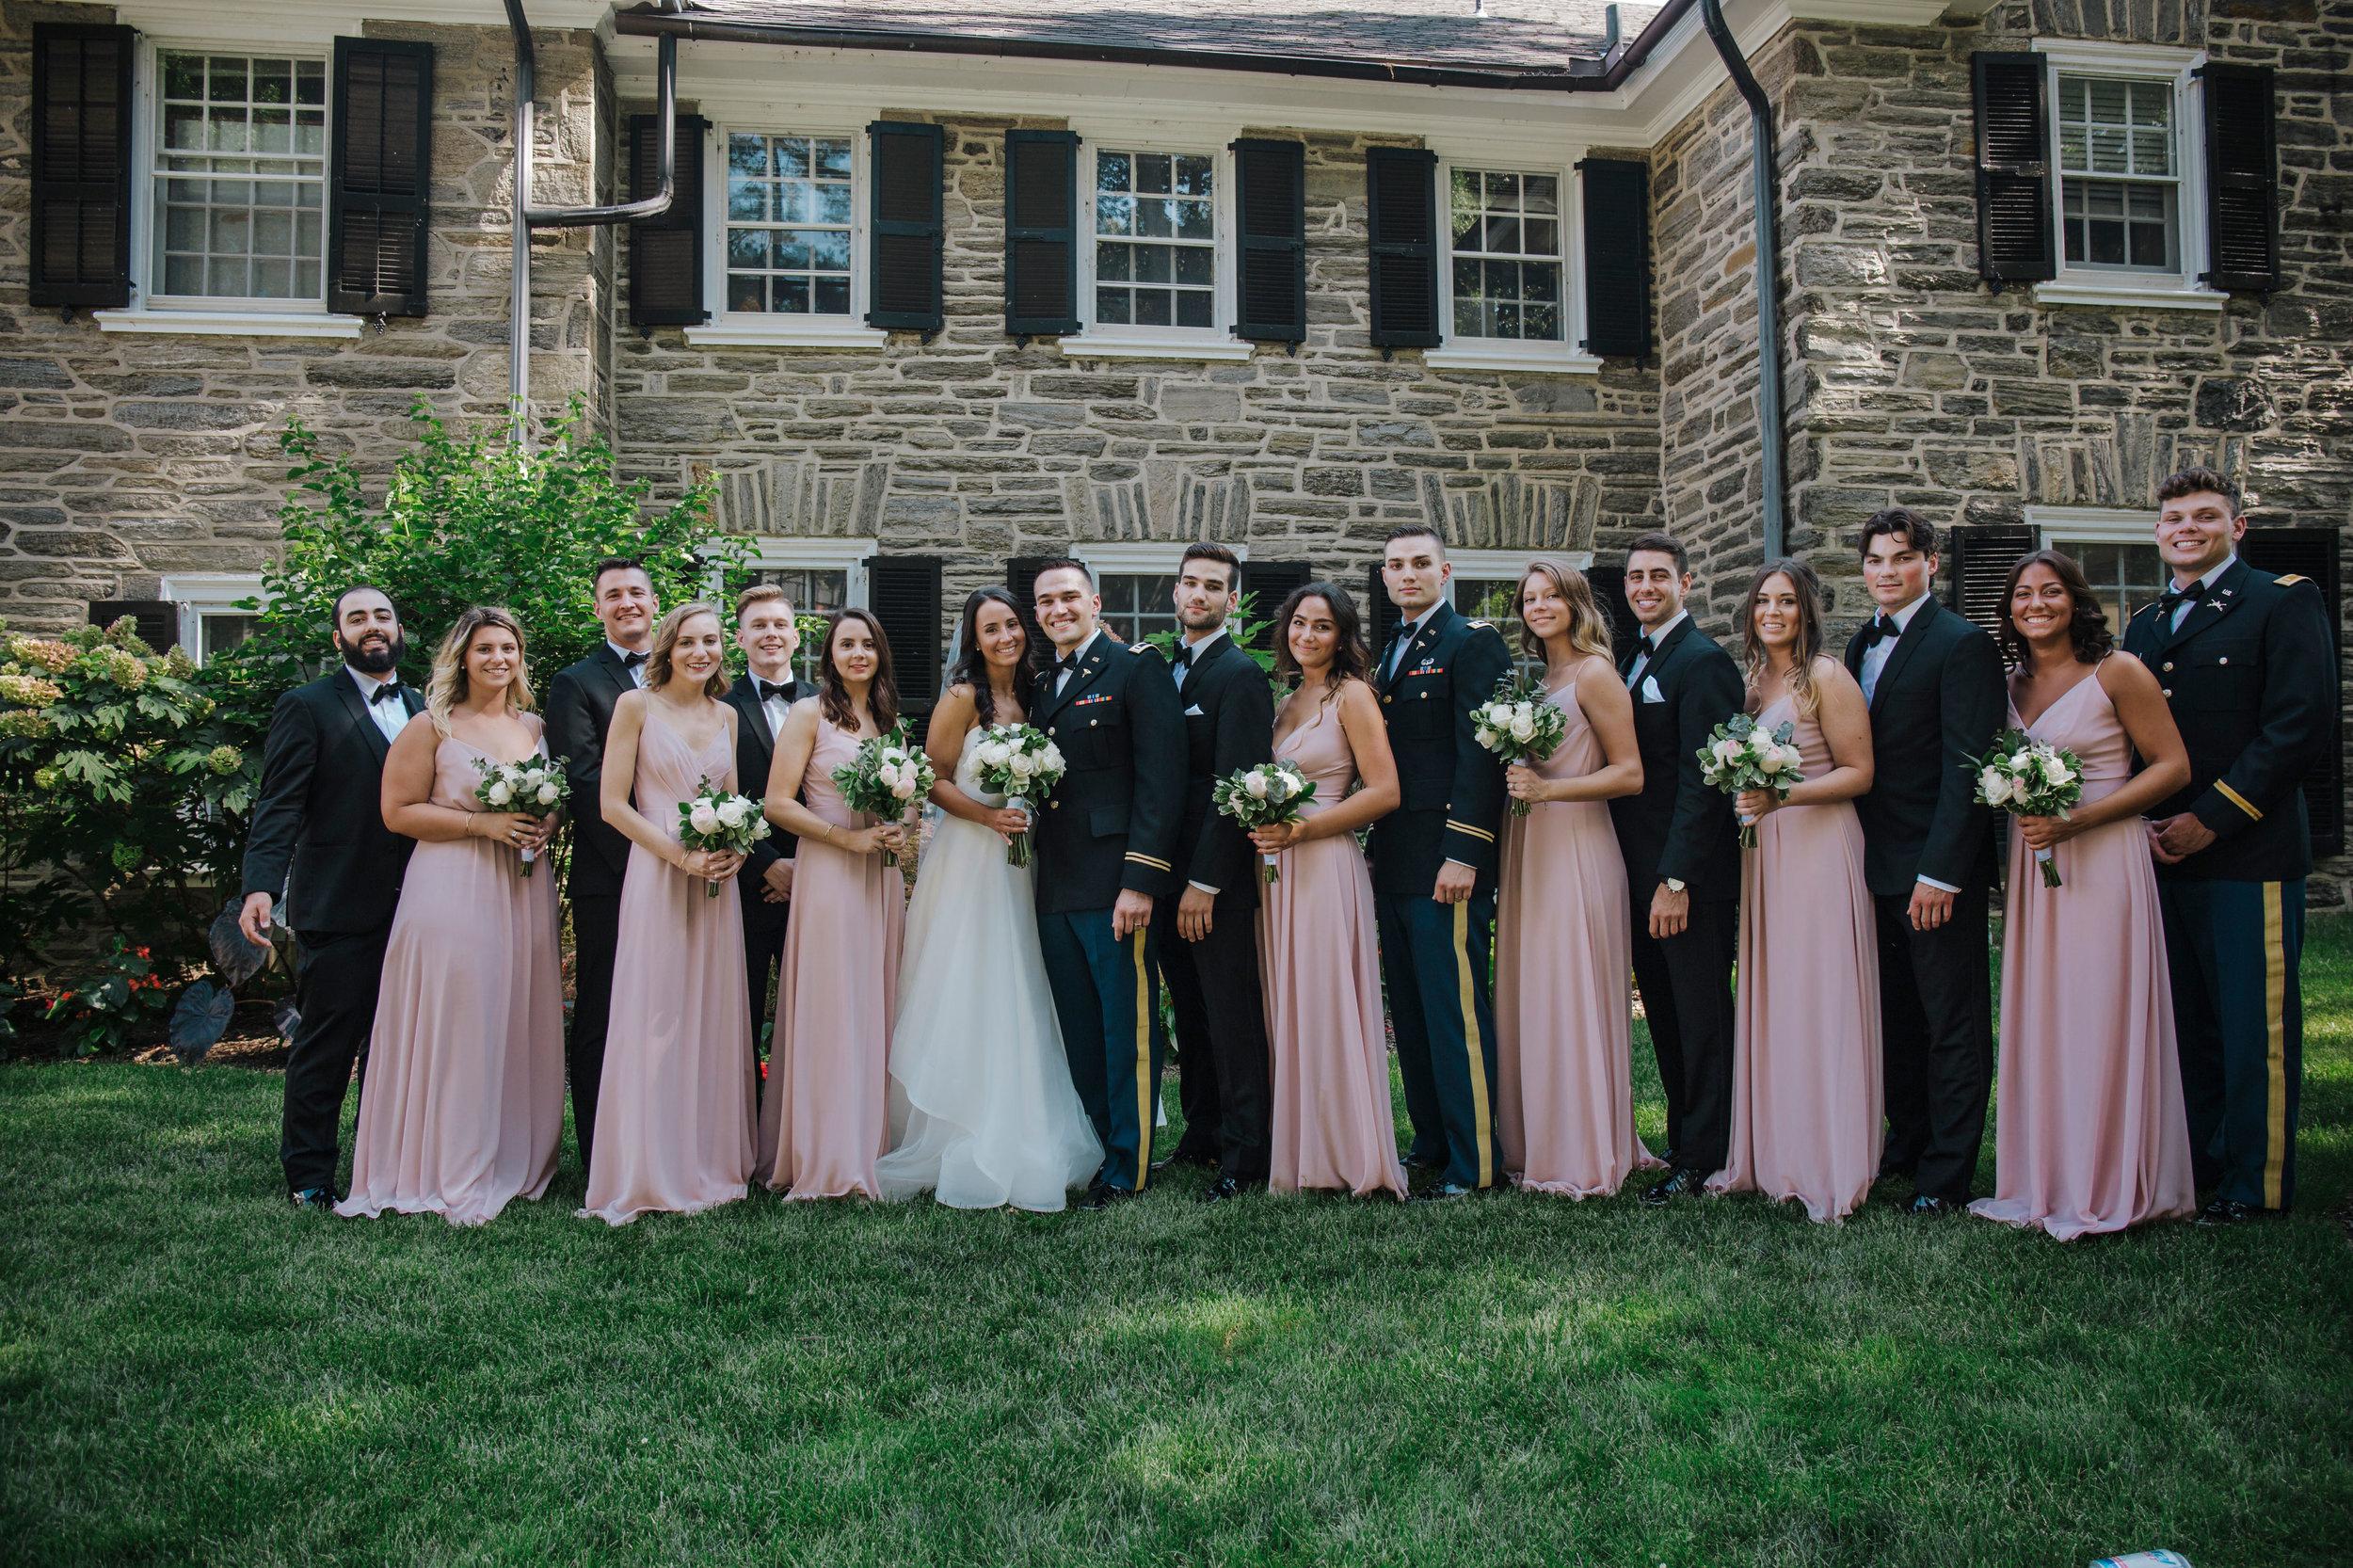 philadelphia-wedding-photographer027.jpg